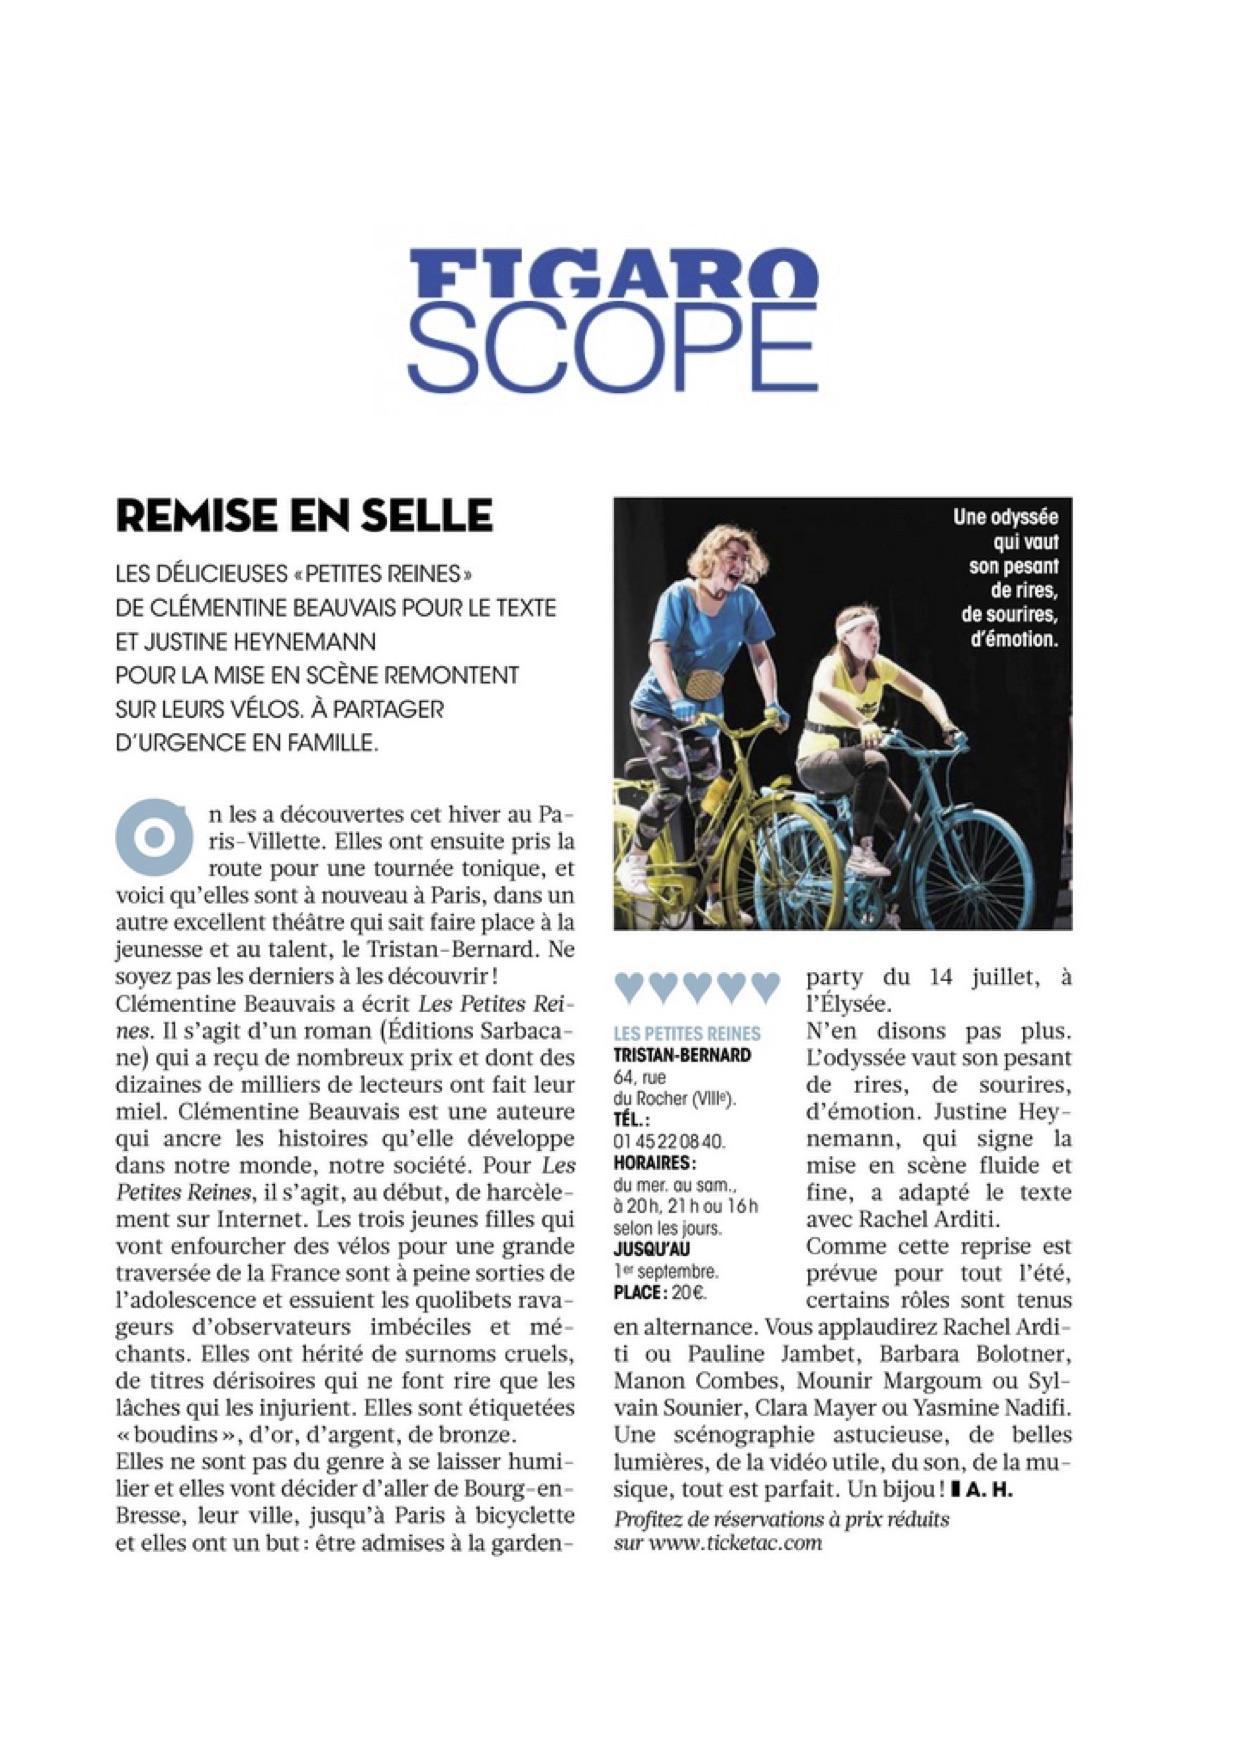 Figaroscope 30.05.18